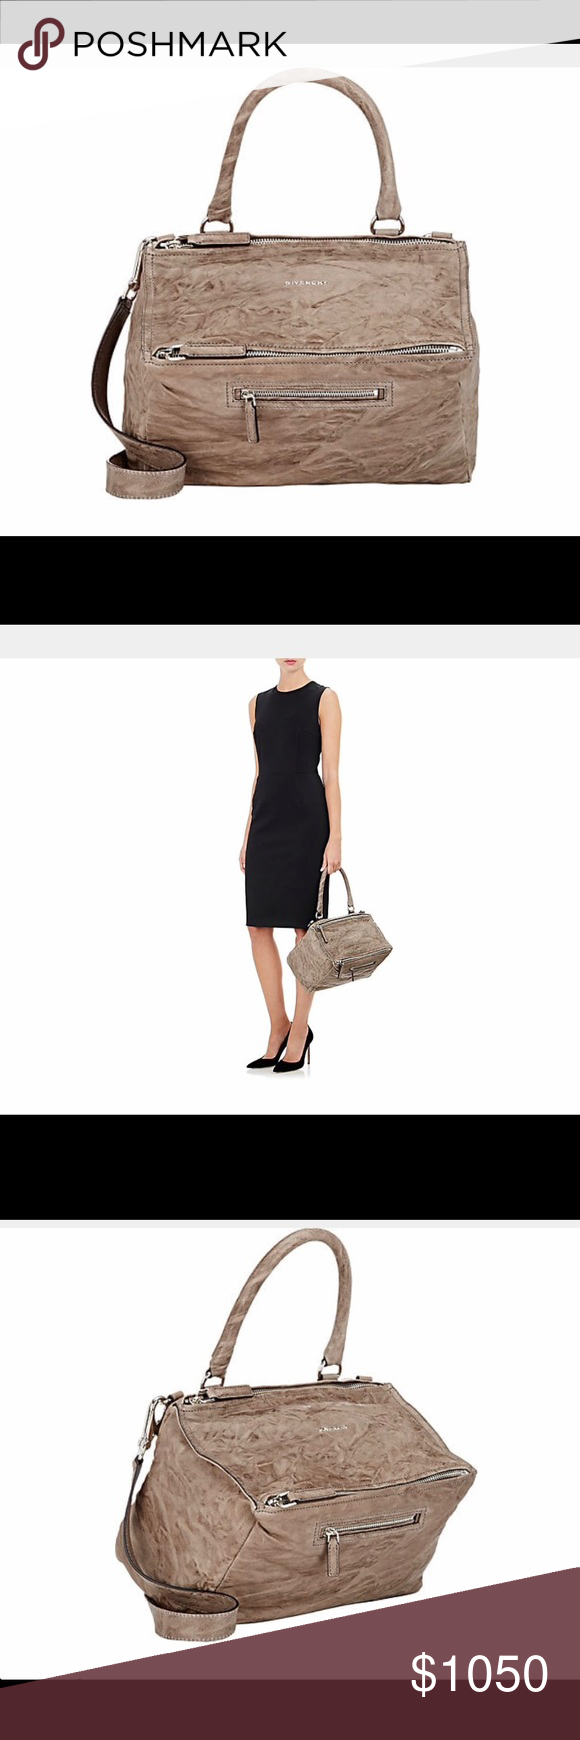 602baf339a NWT Givenchy Pandora Pepe Medium Leather Bag Givenchy s charcoal wrinkled  sheepskin Pandora Pepe medium messenger bag